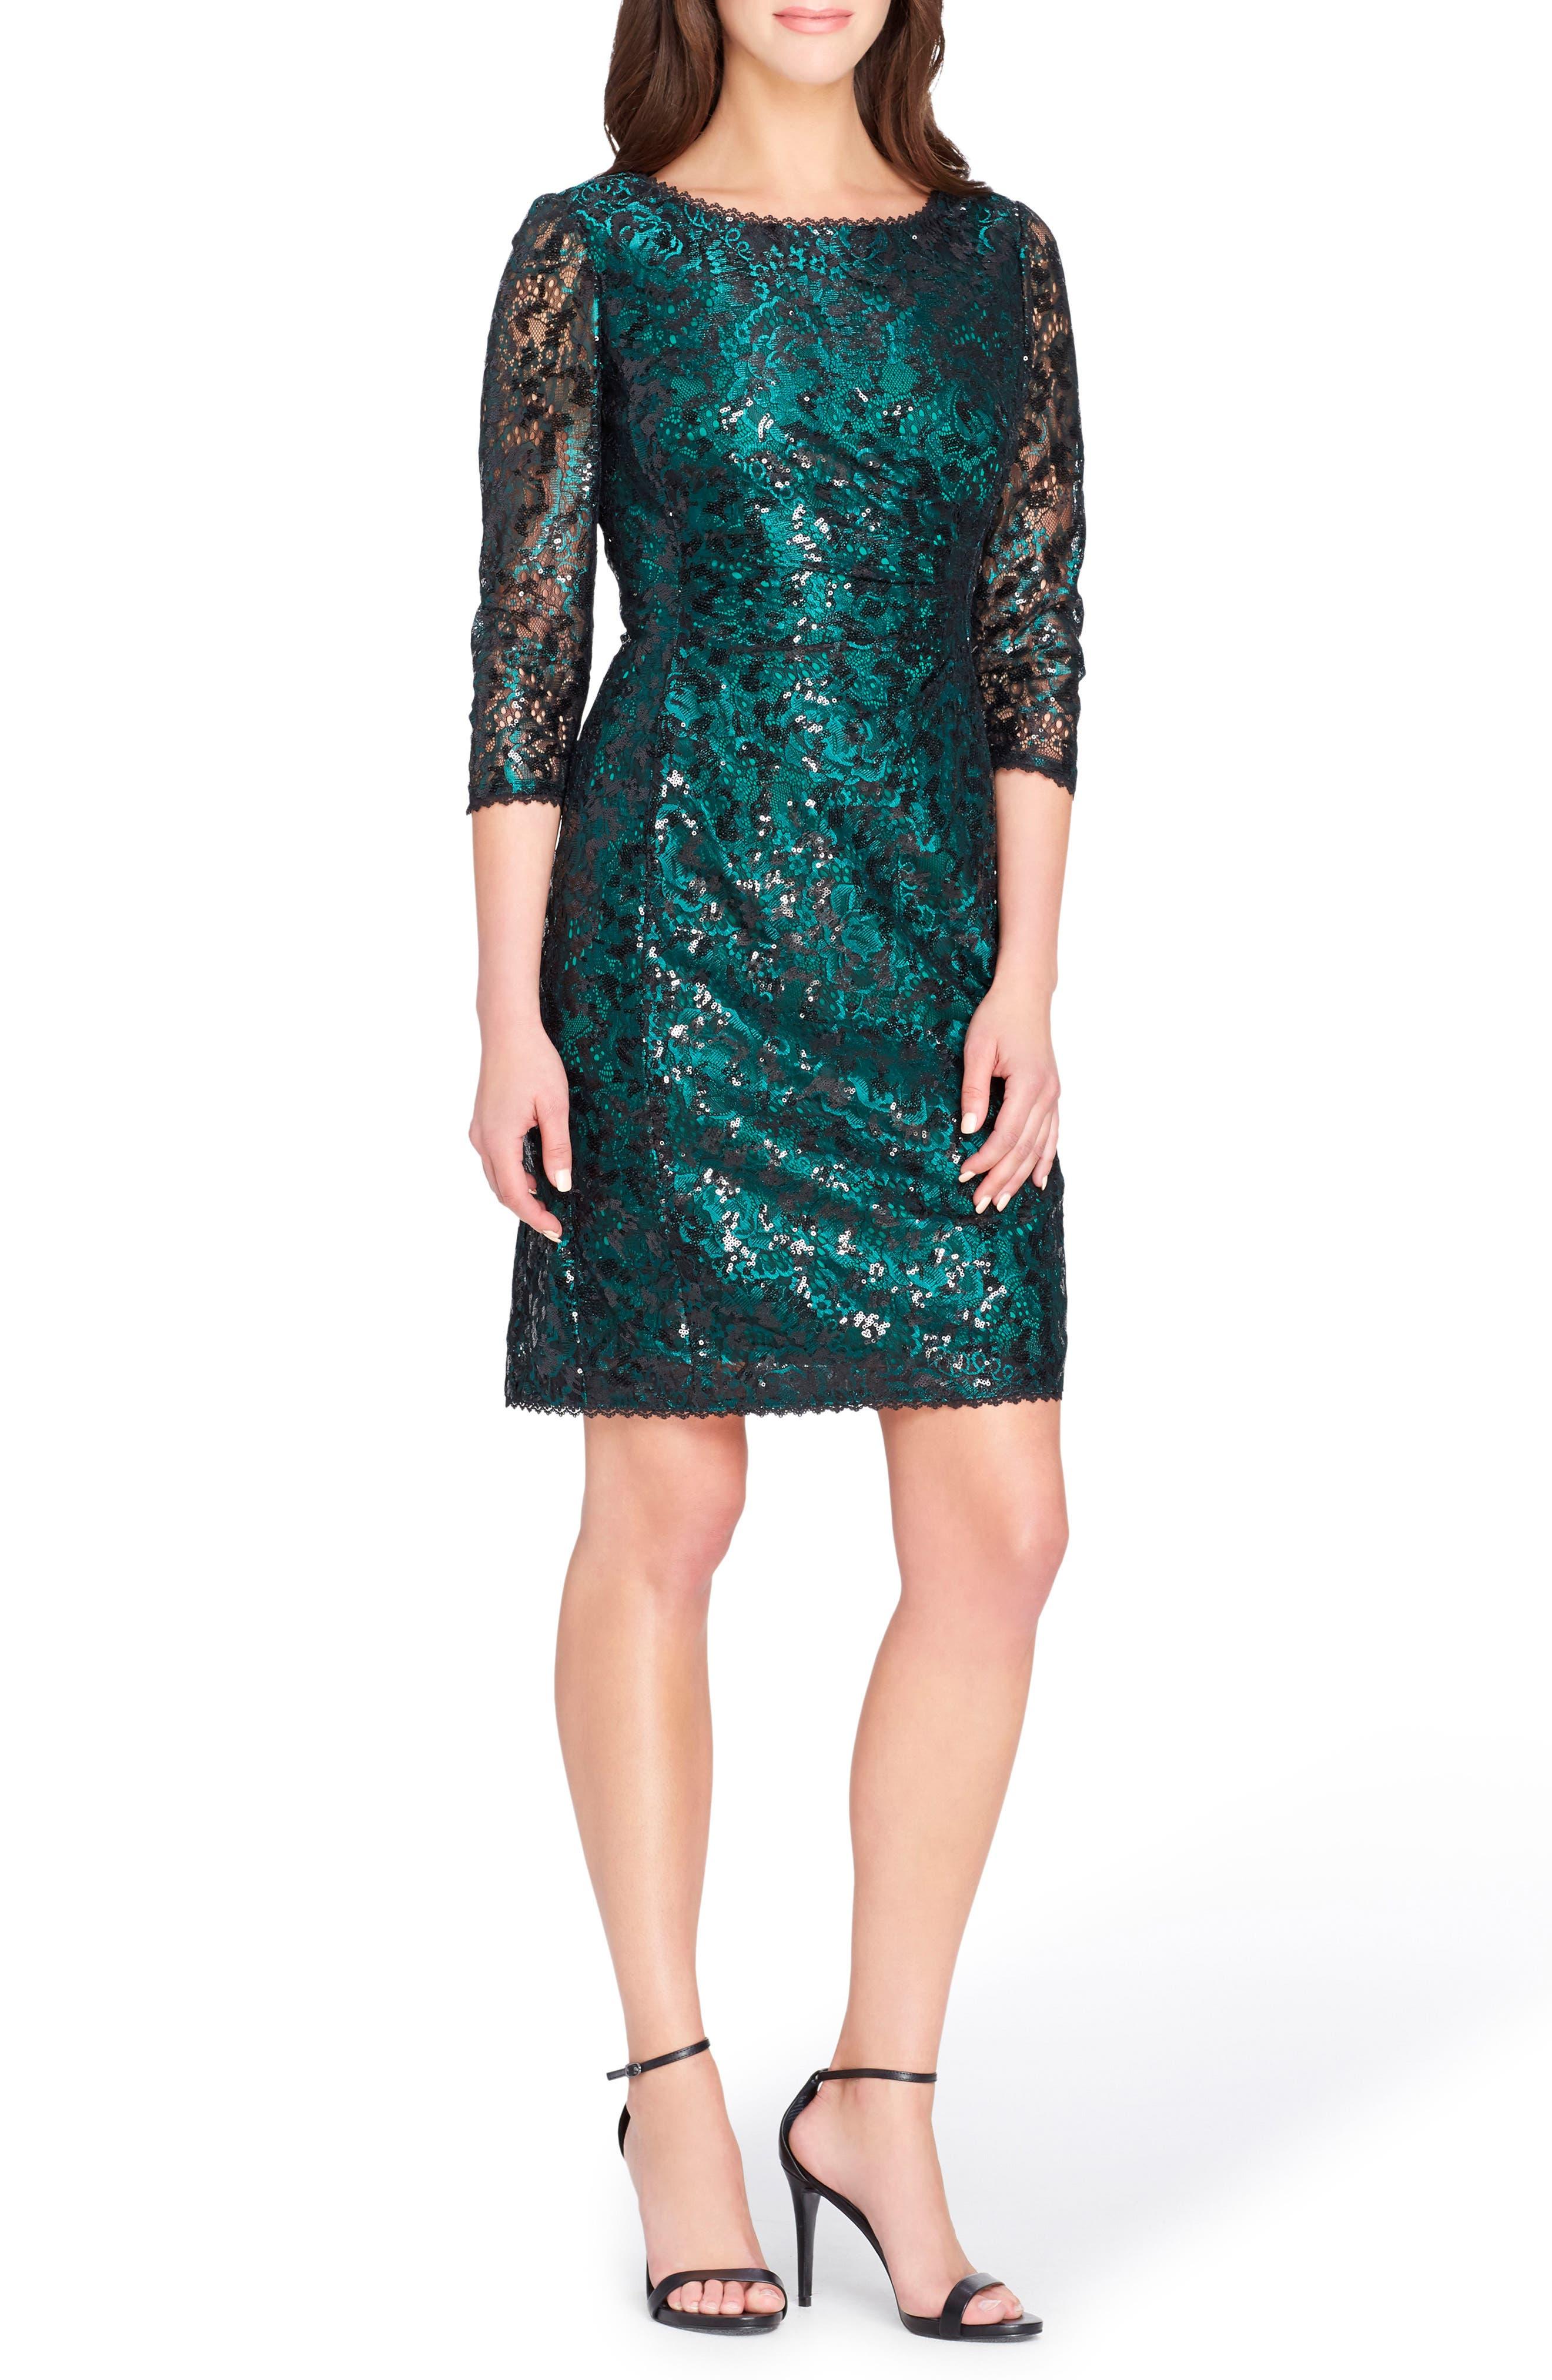 Chemical Lace Sheath Dress,                         Main,                         color, Emerald Green/ Black